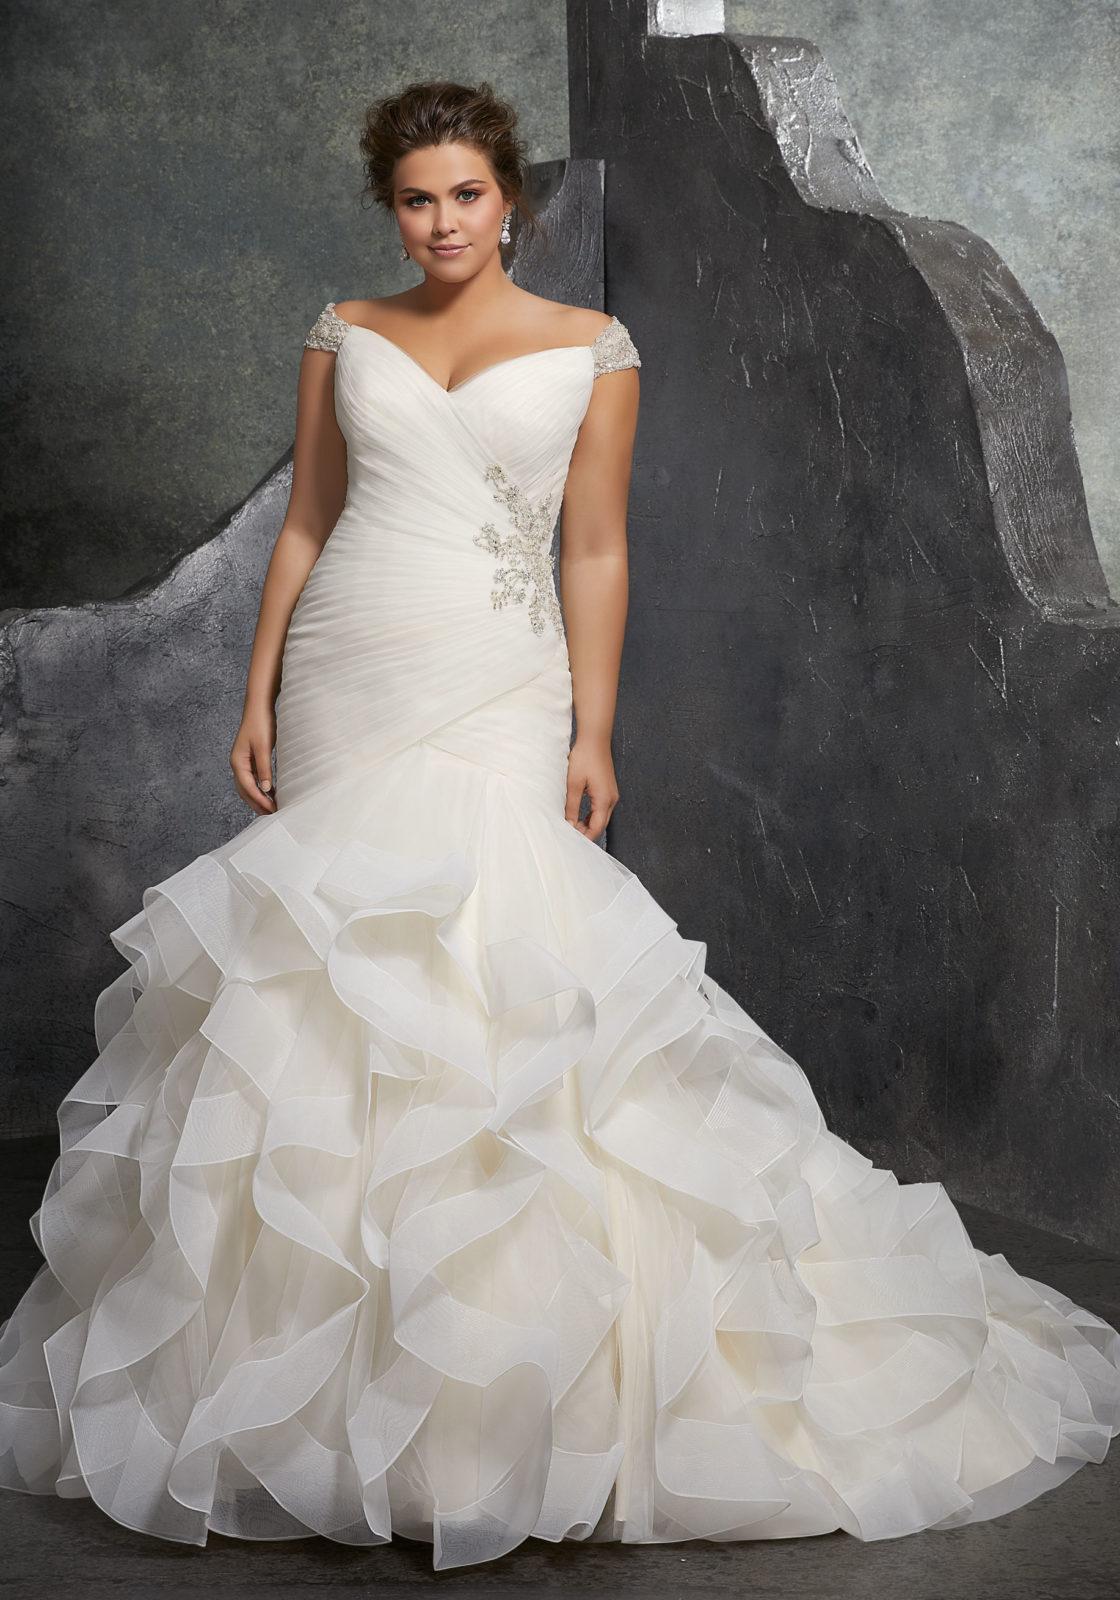 beige wedding dresses plus size photo - 1